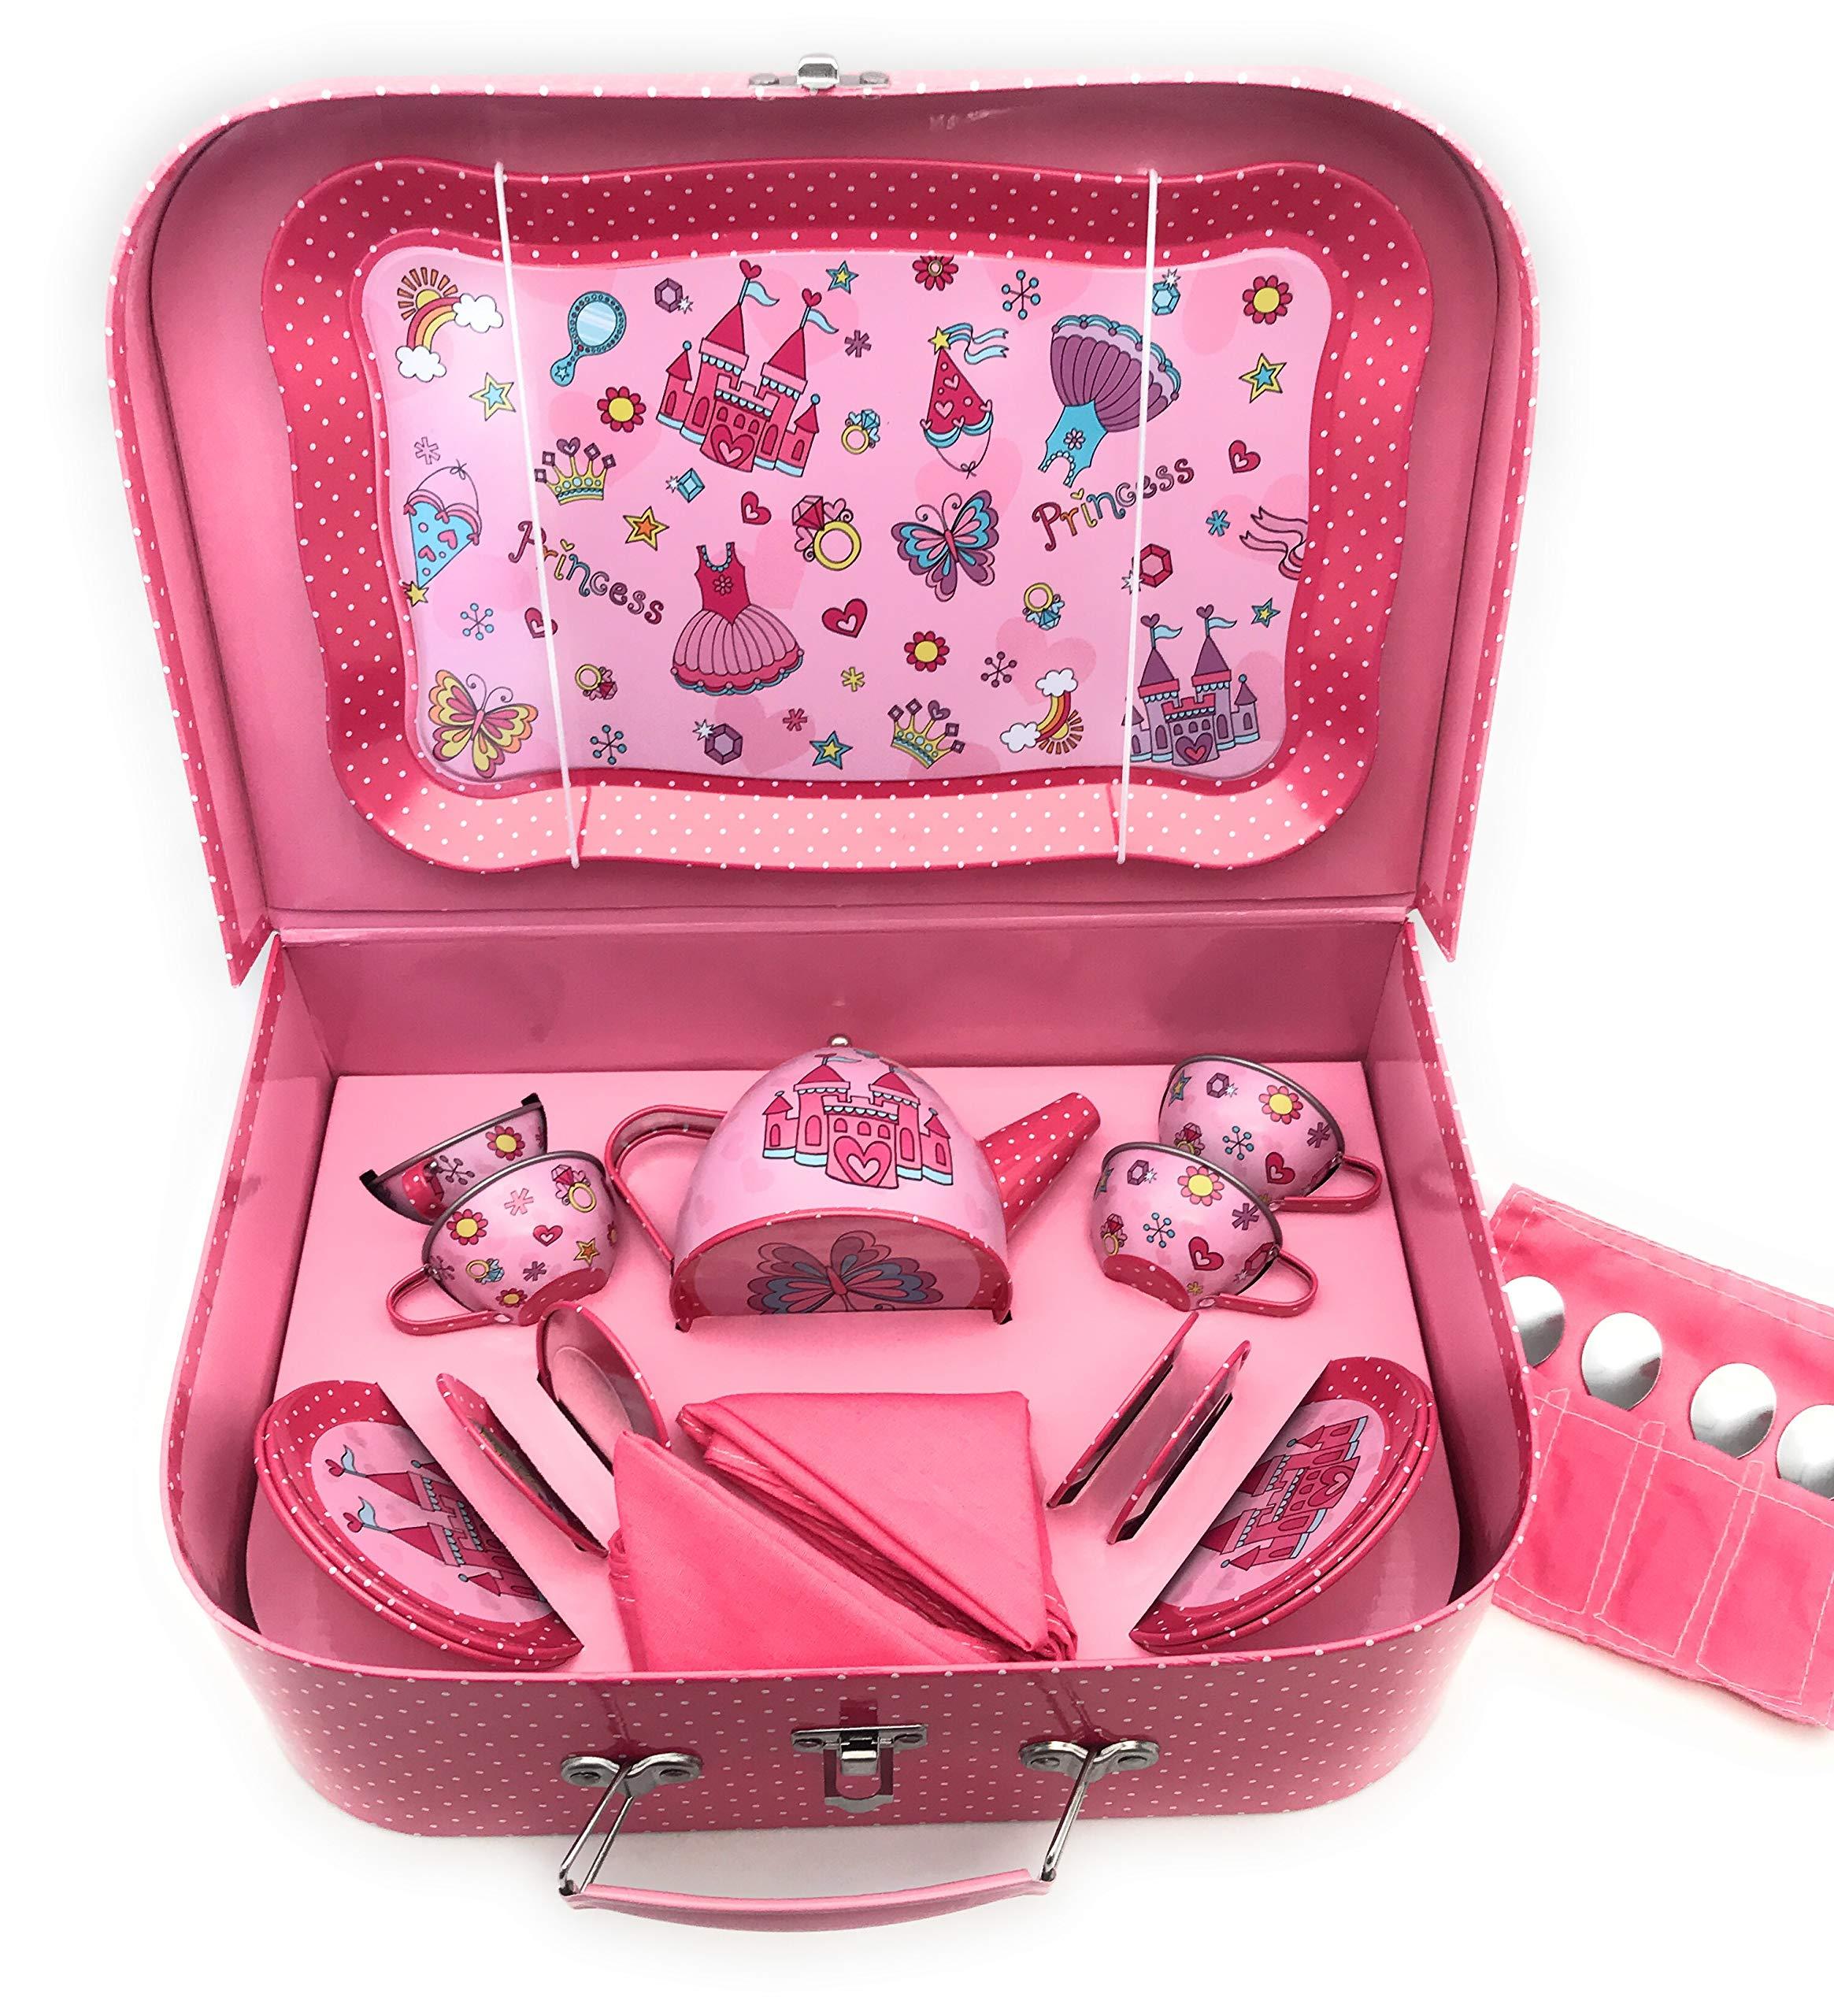 Oojami 23 Piece Childrens Pretend Tin Tea Set Including a Carrying case Princess Theme